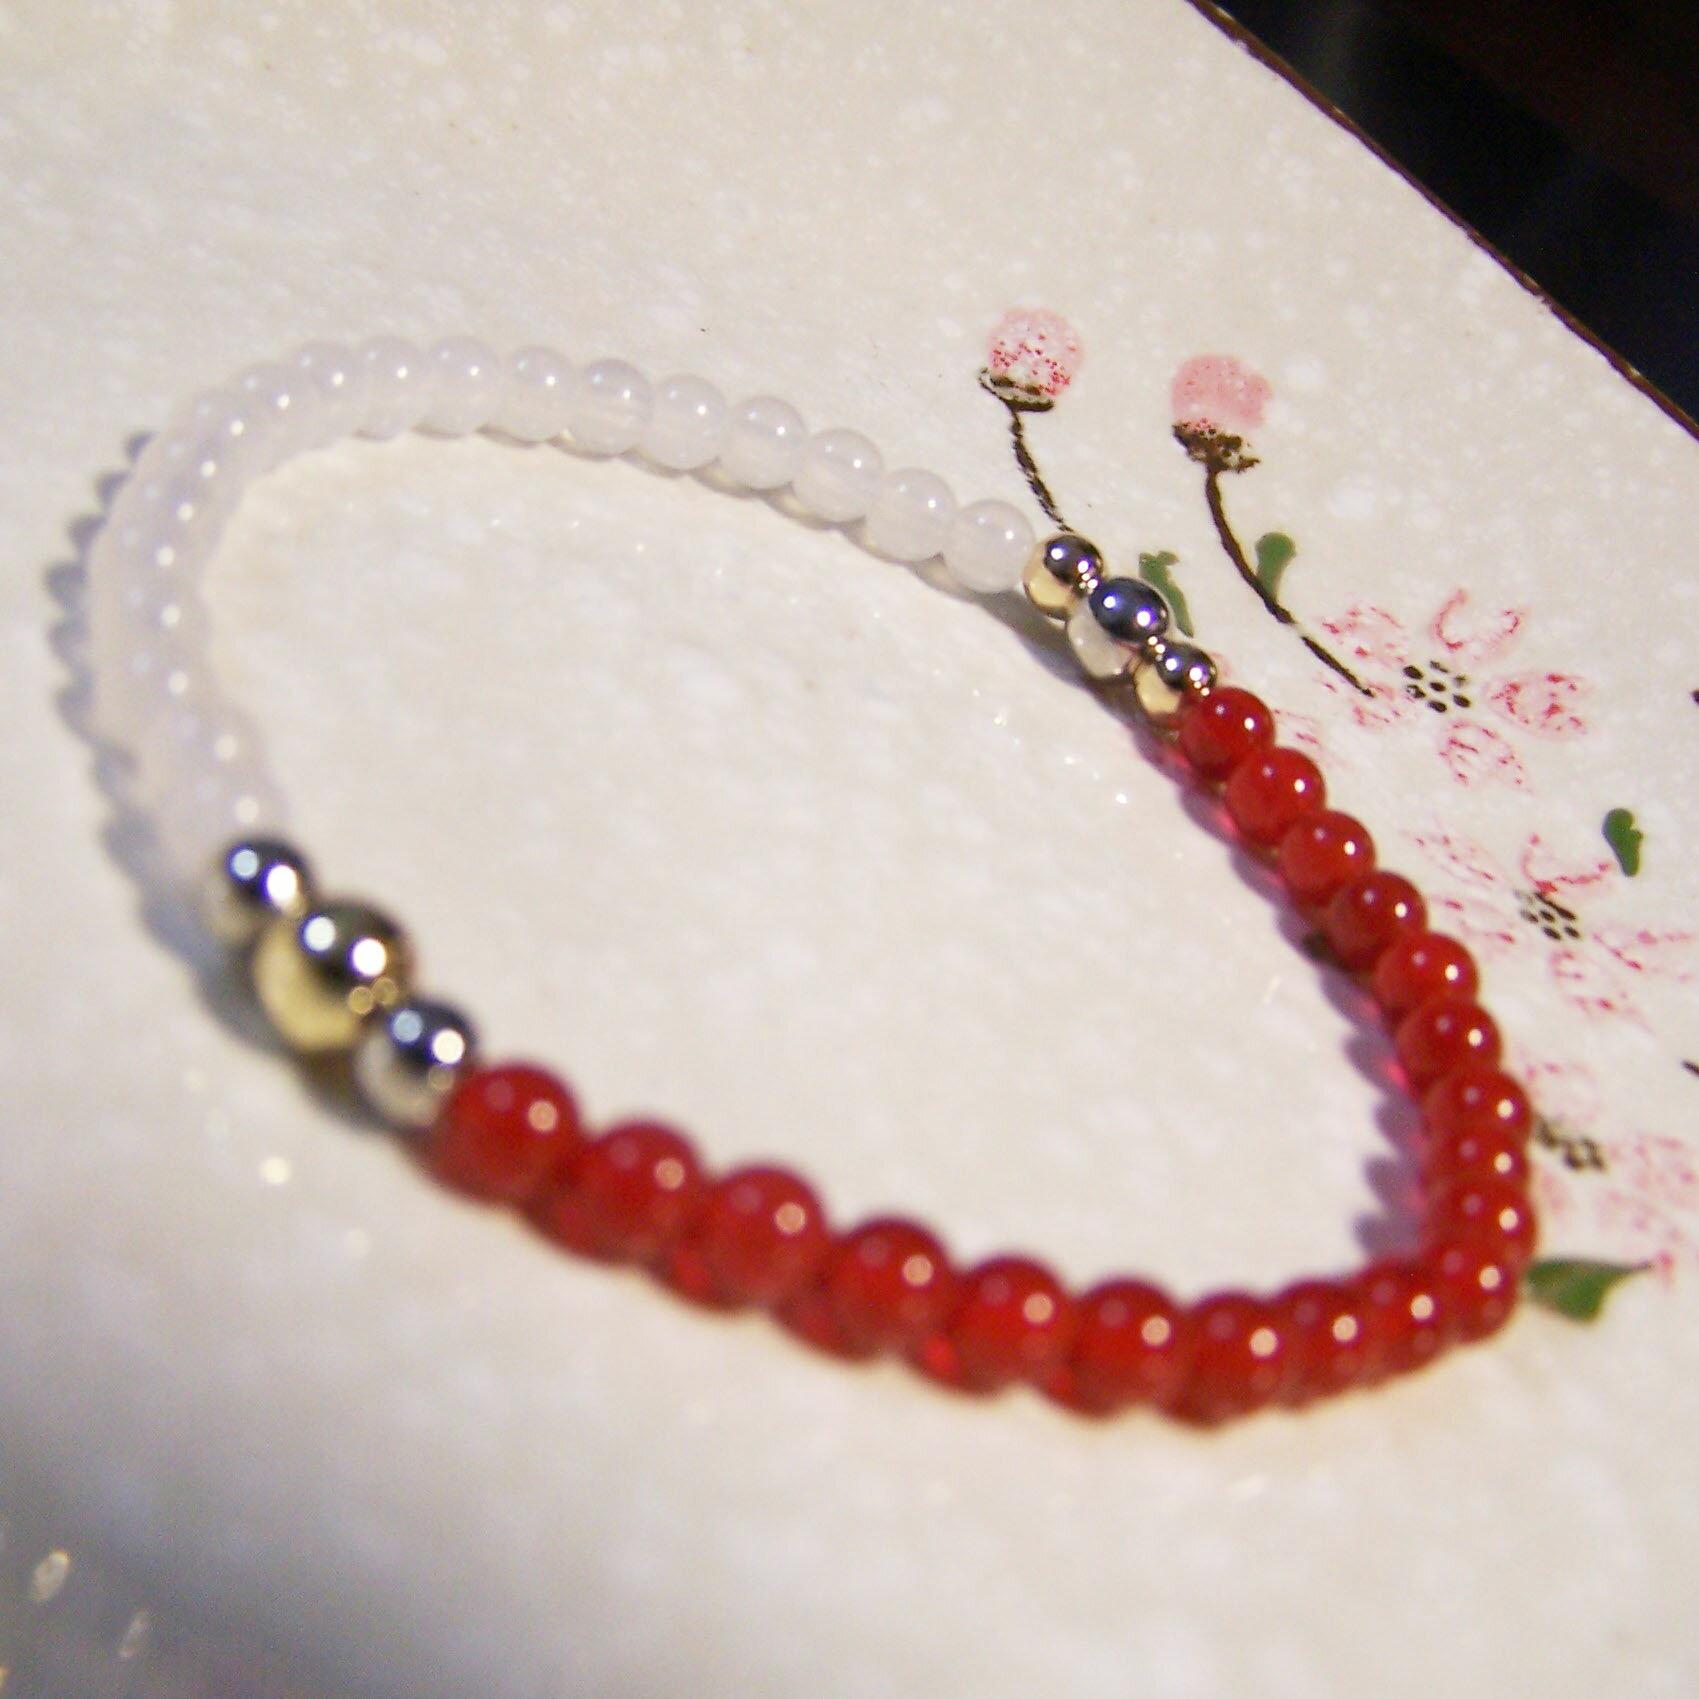 be young【比漾】Mini 秀麗手環 (紅瑪瑙+晶白玉) 單圈手鏈 2